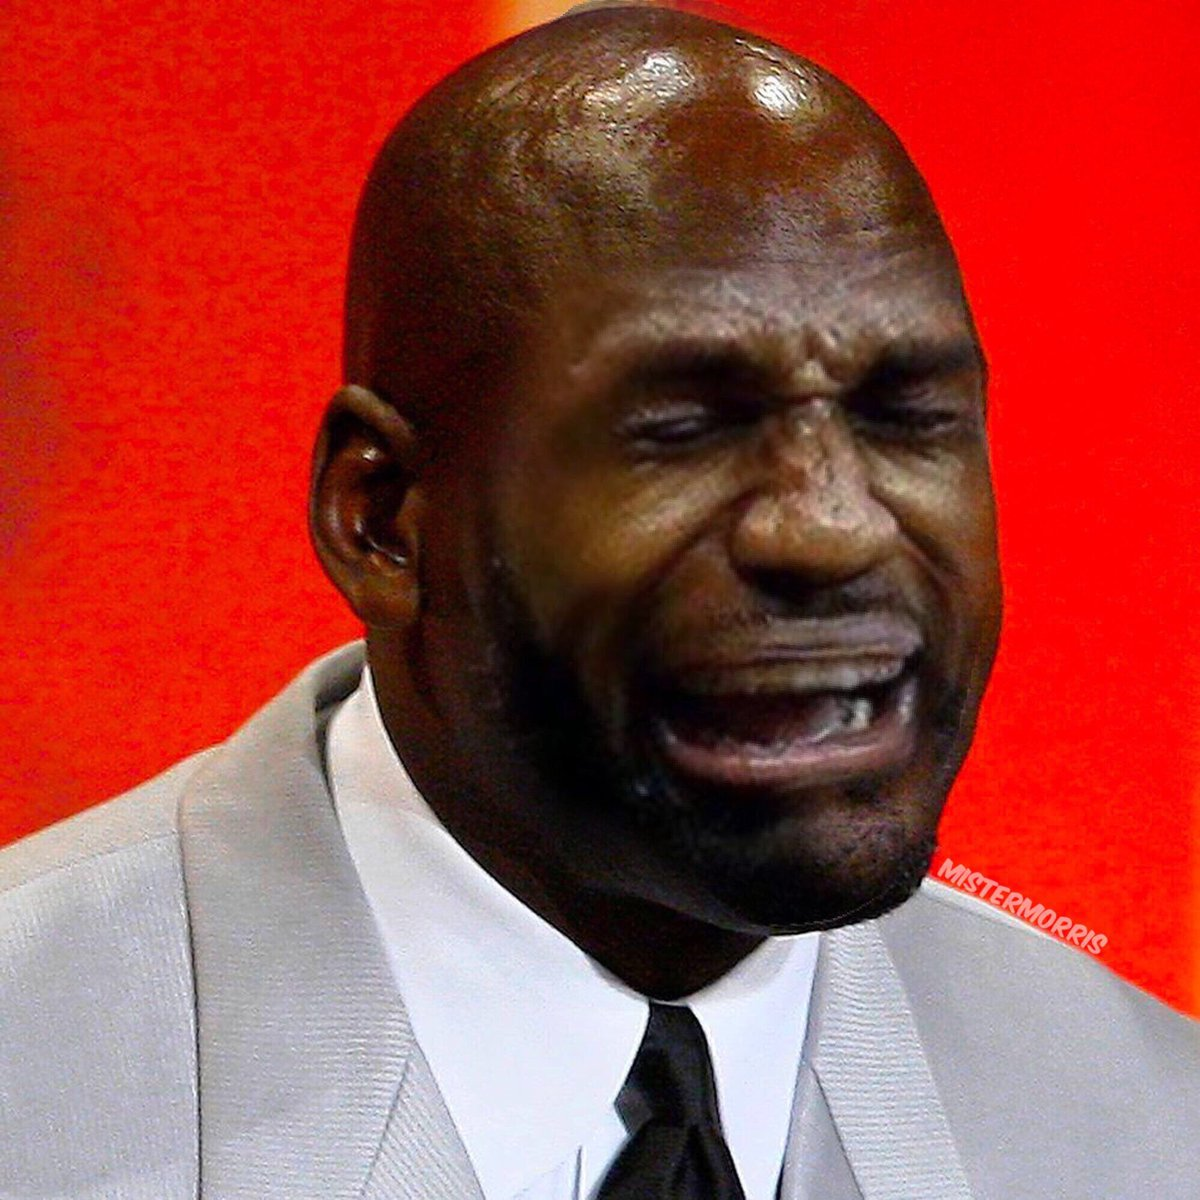 Crying Jordan on Twitter